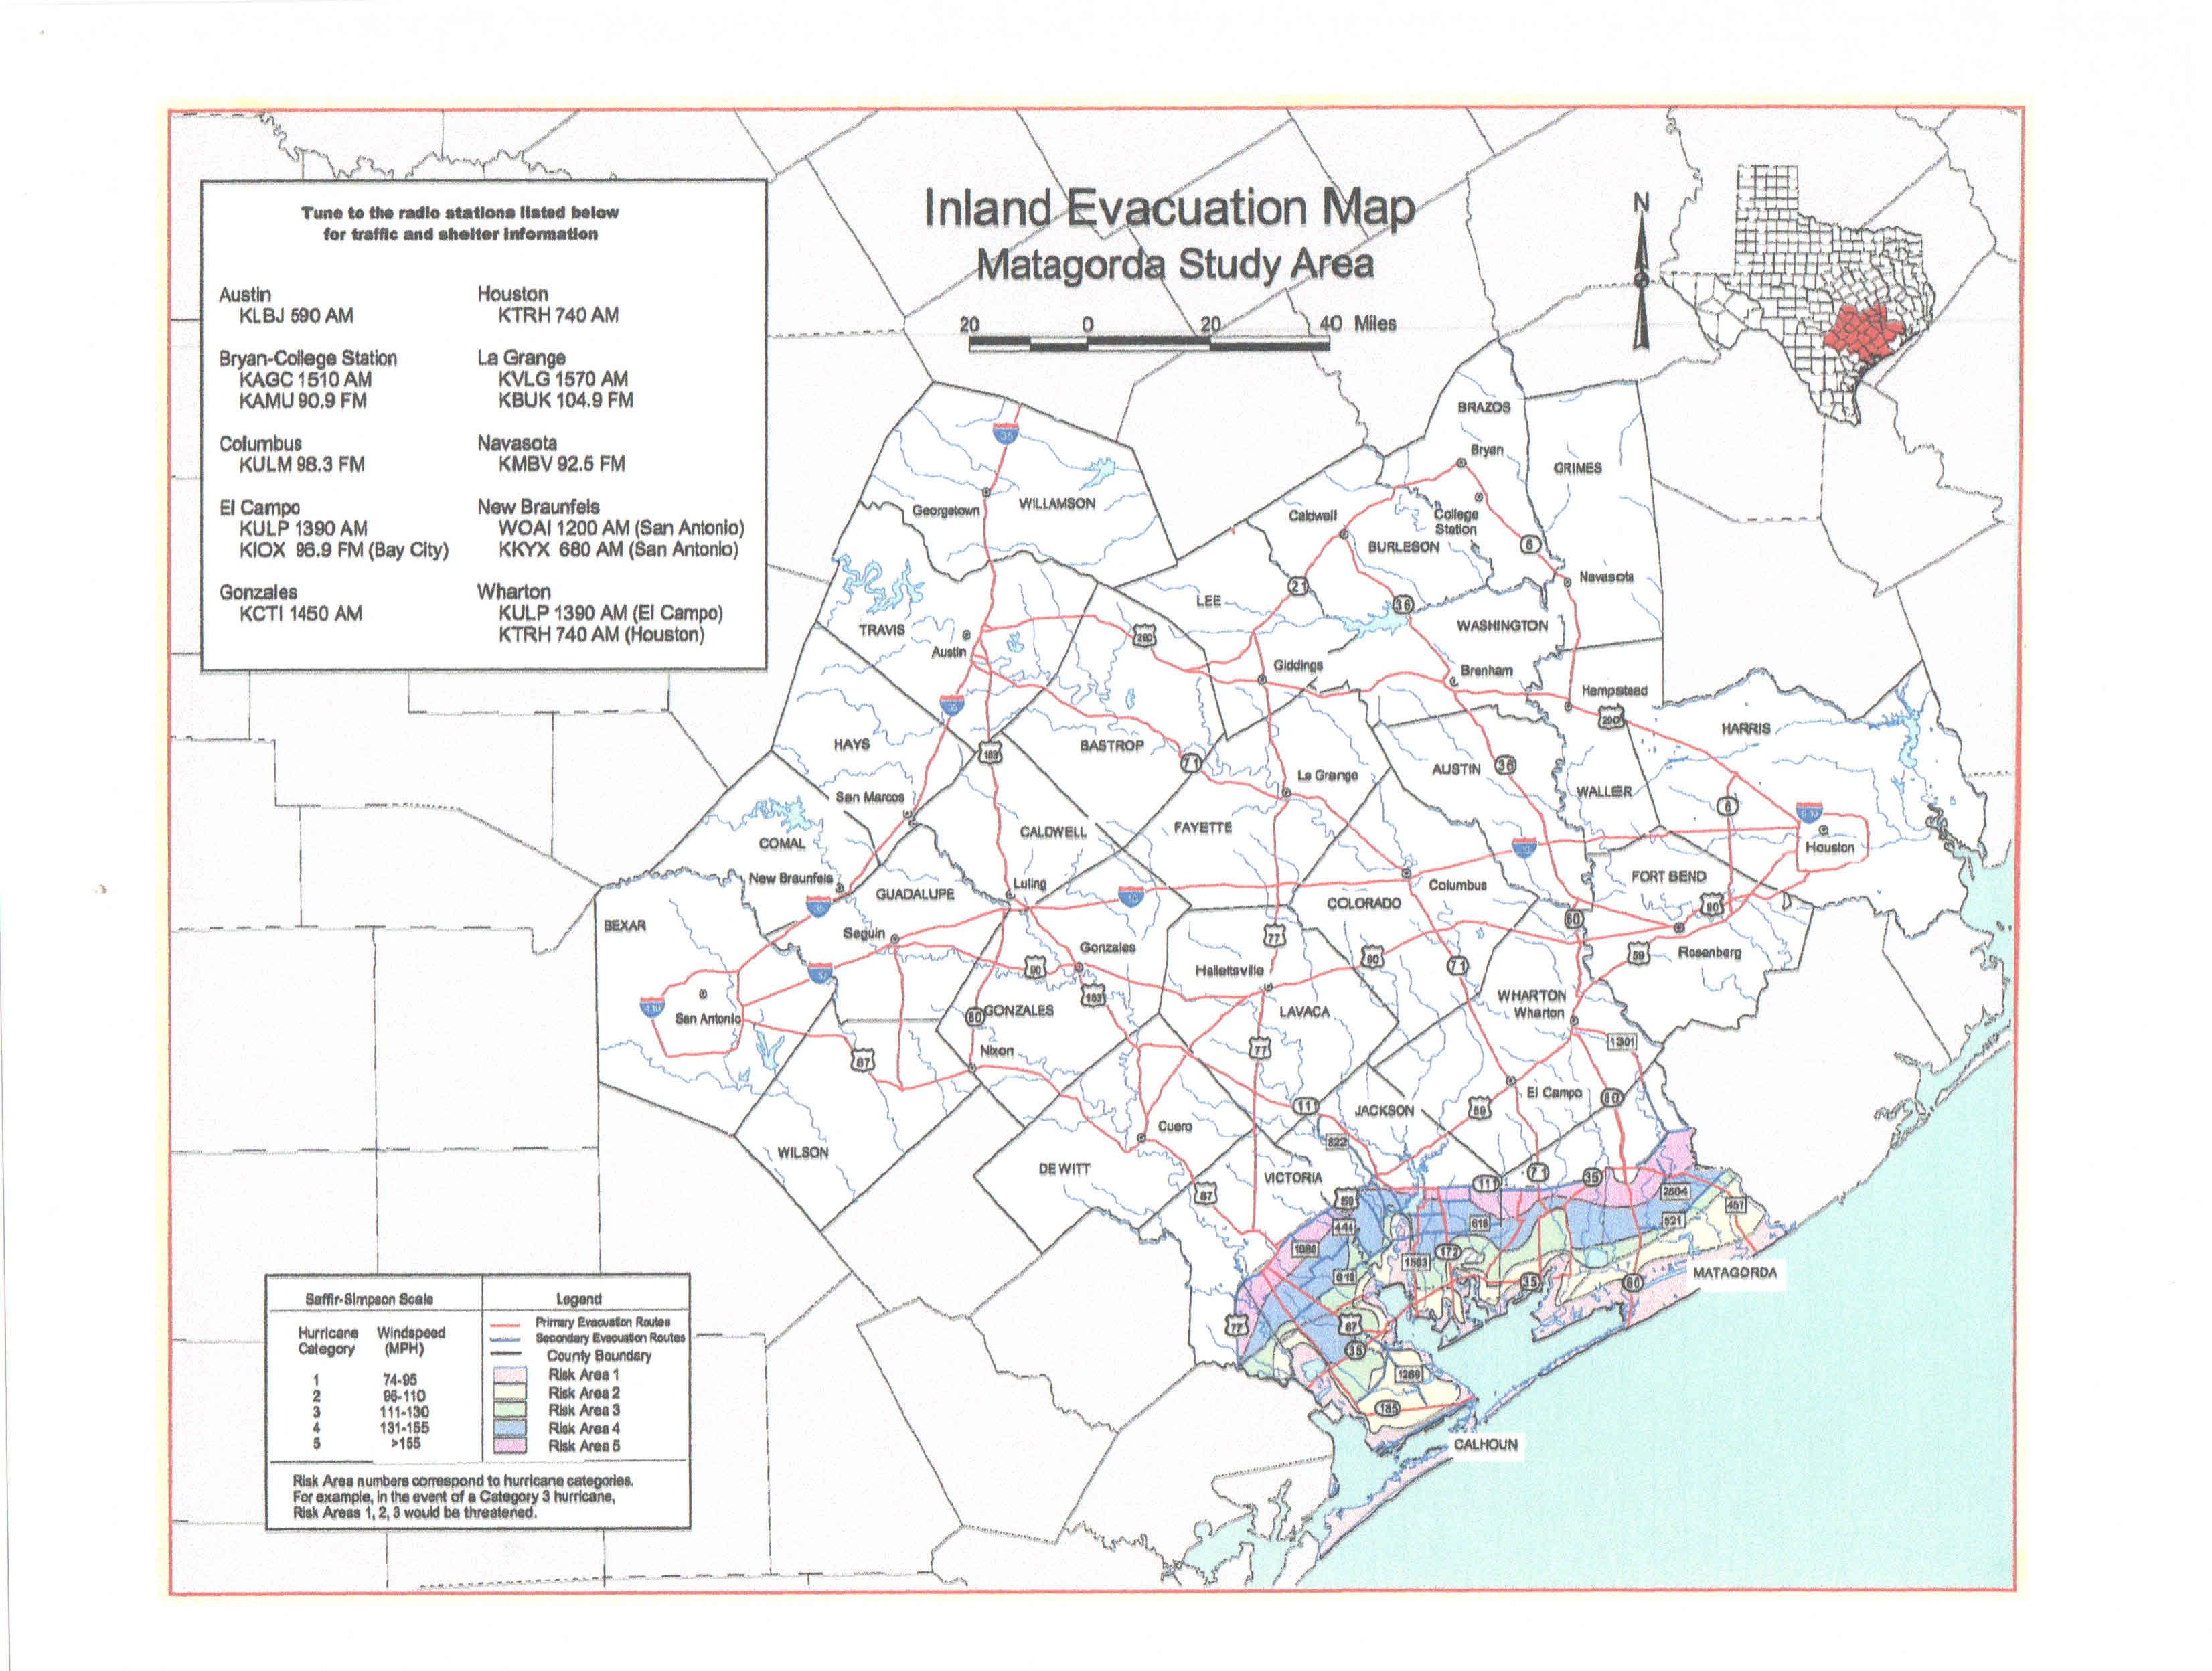 Inland Evacuation Map